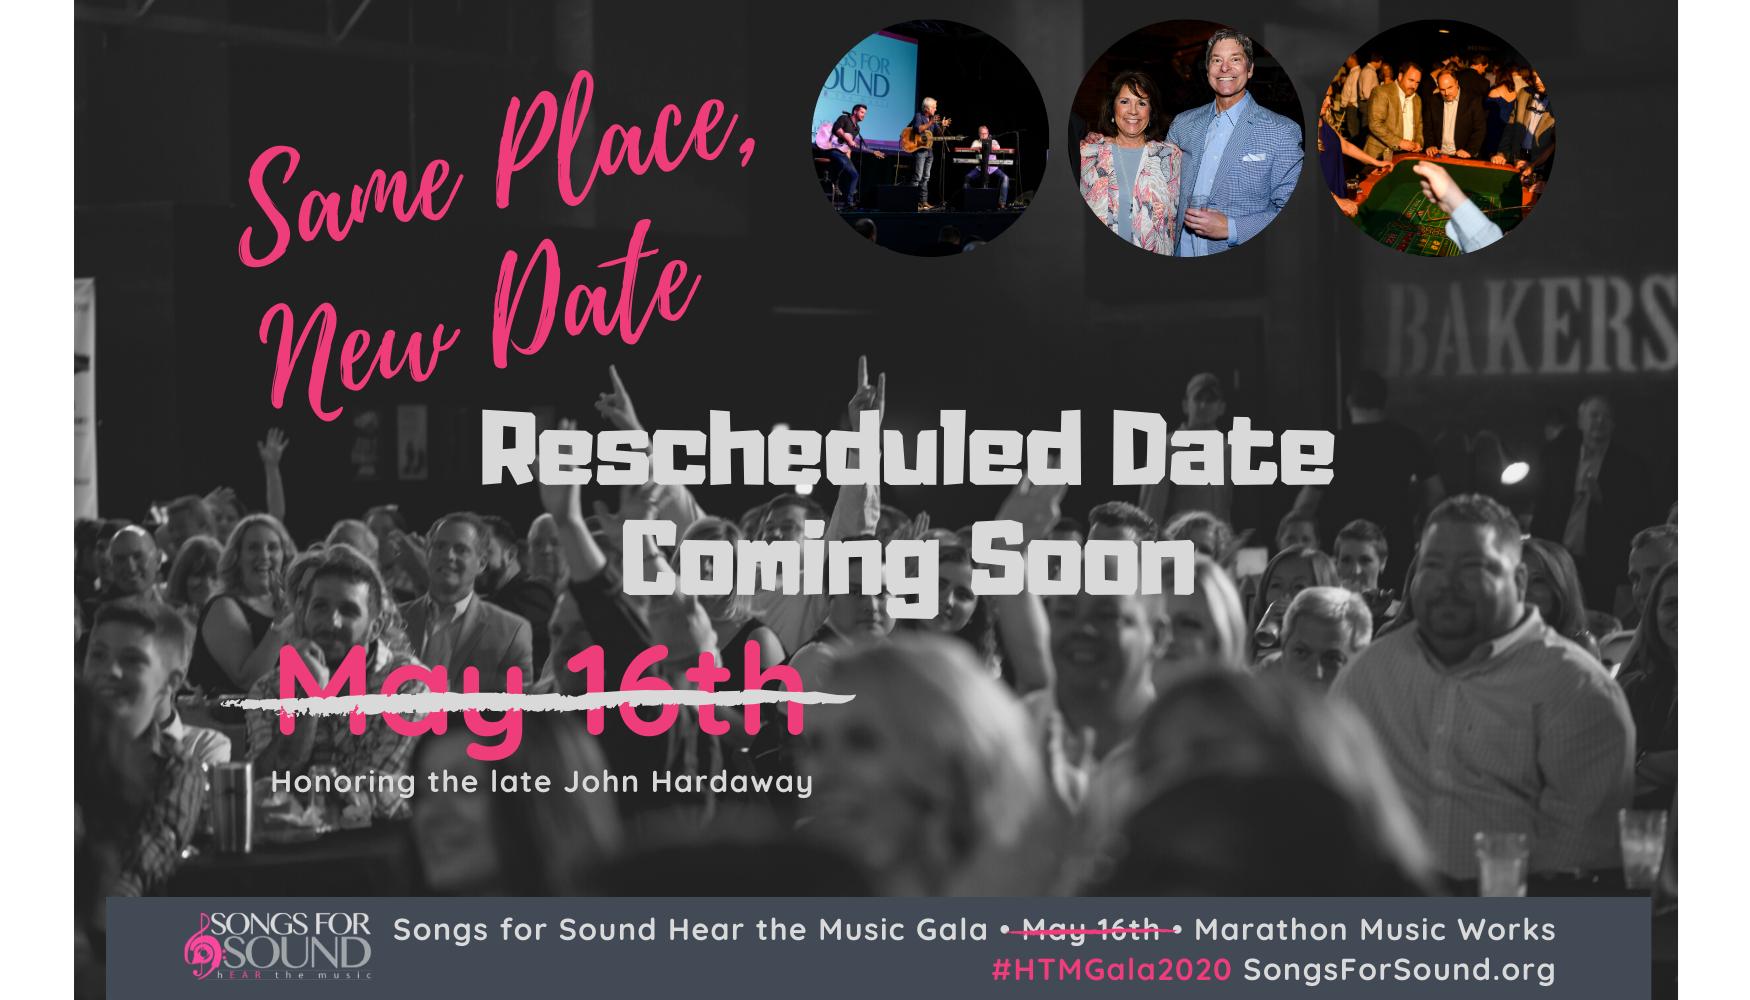 Hear the Music Gala 2020 - Date Coming Soon!